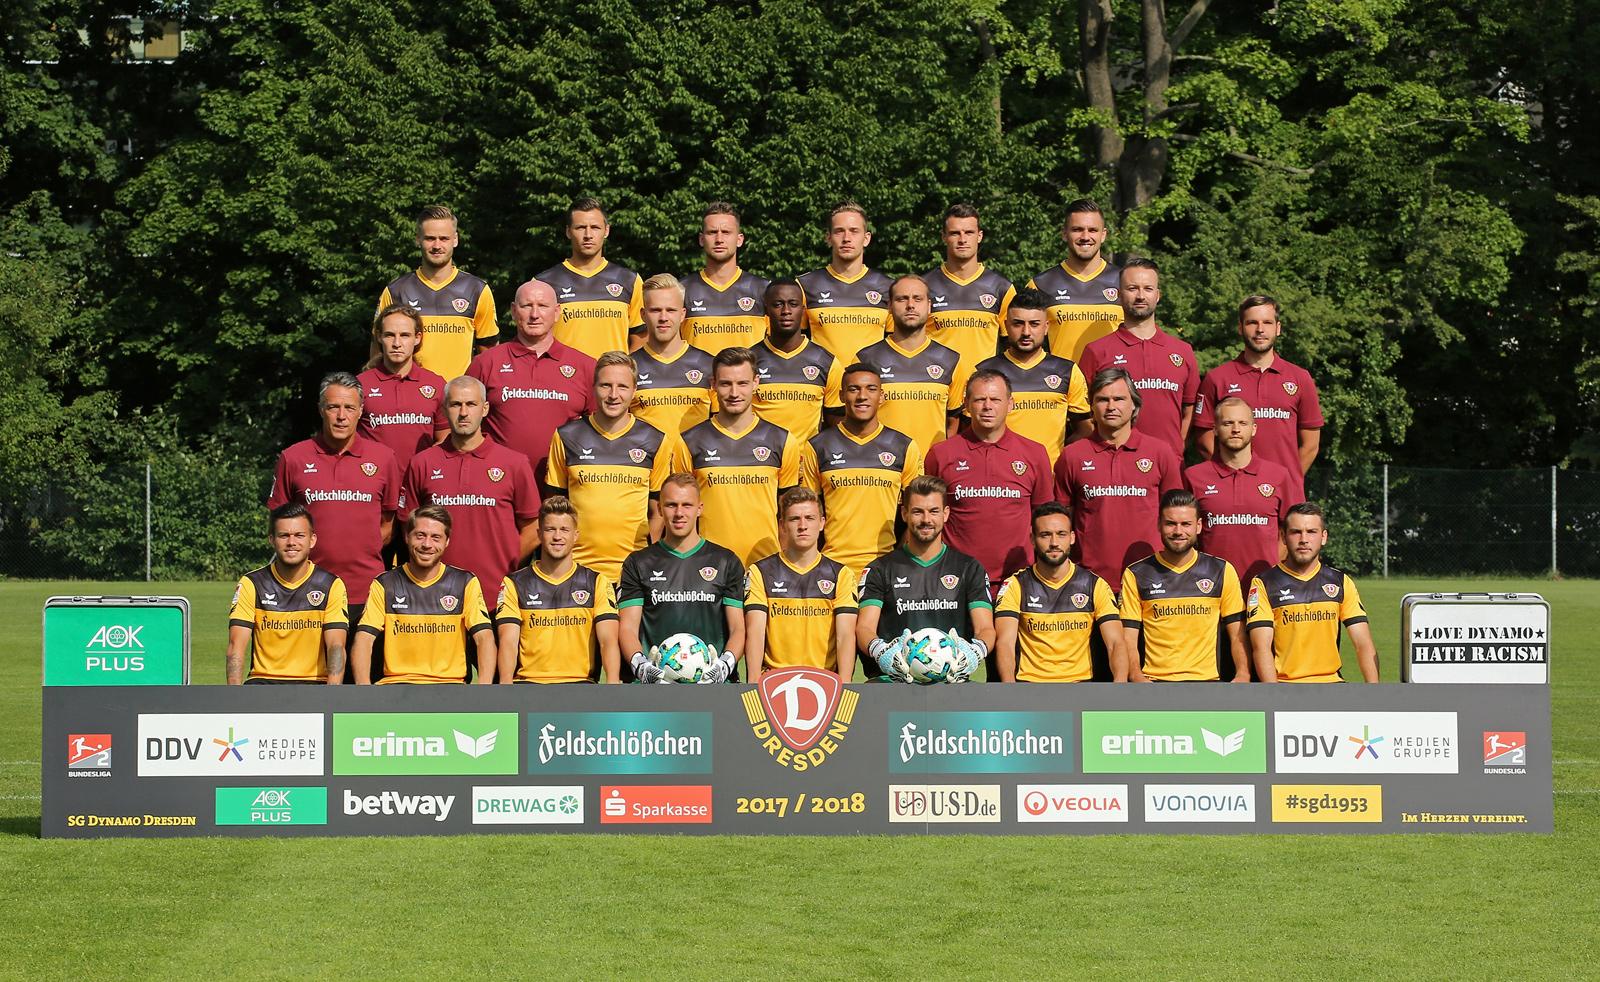 Sg Dynamo Dresden App